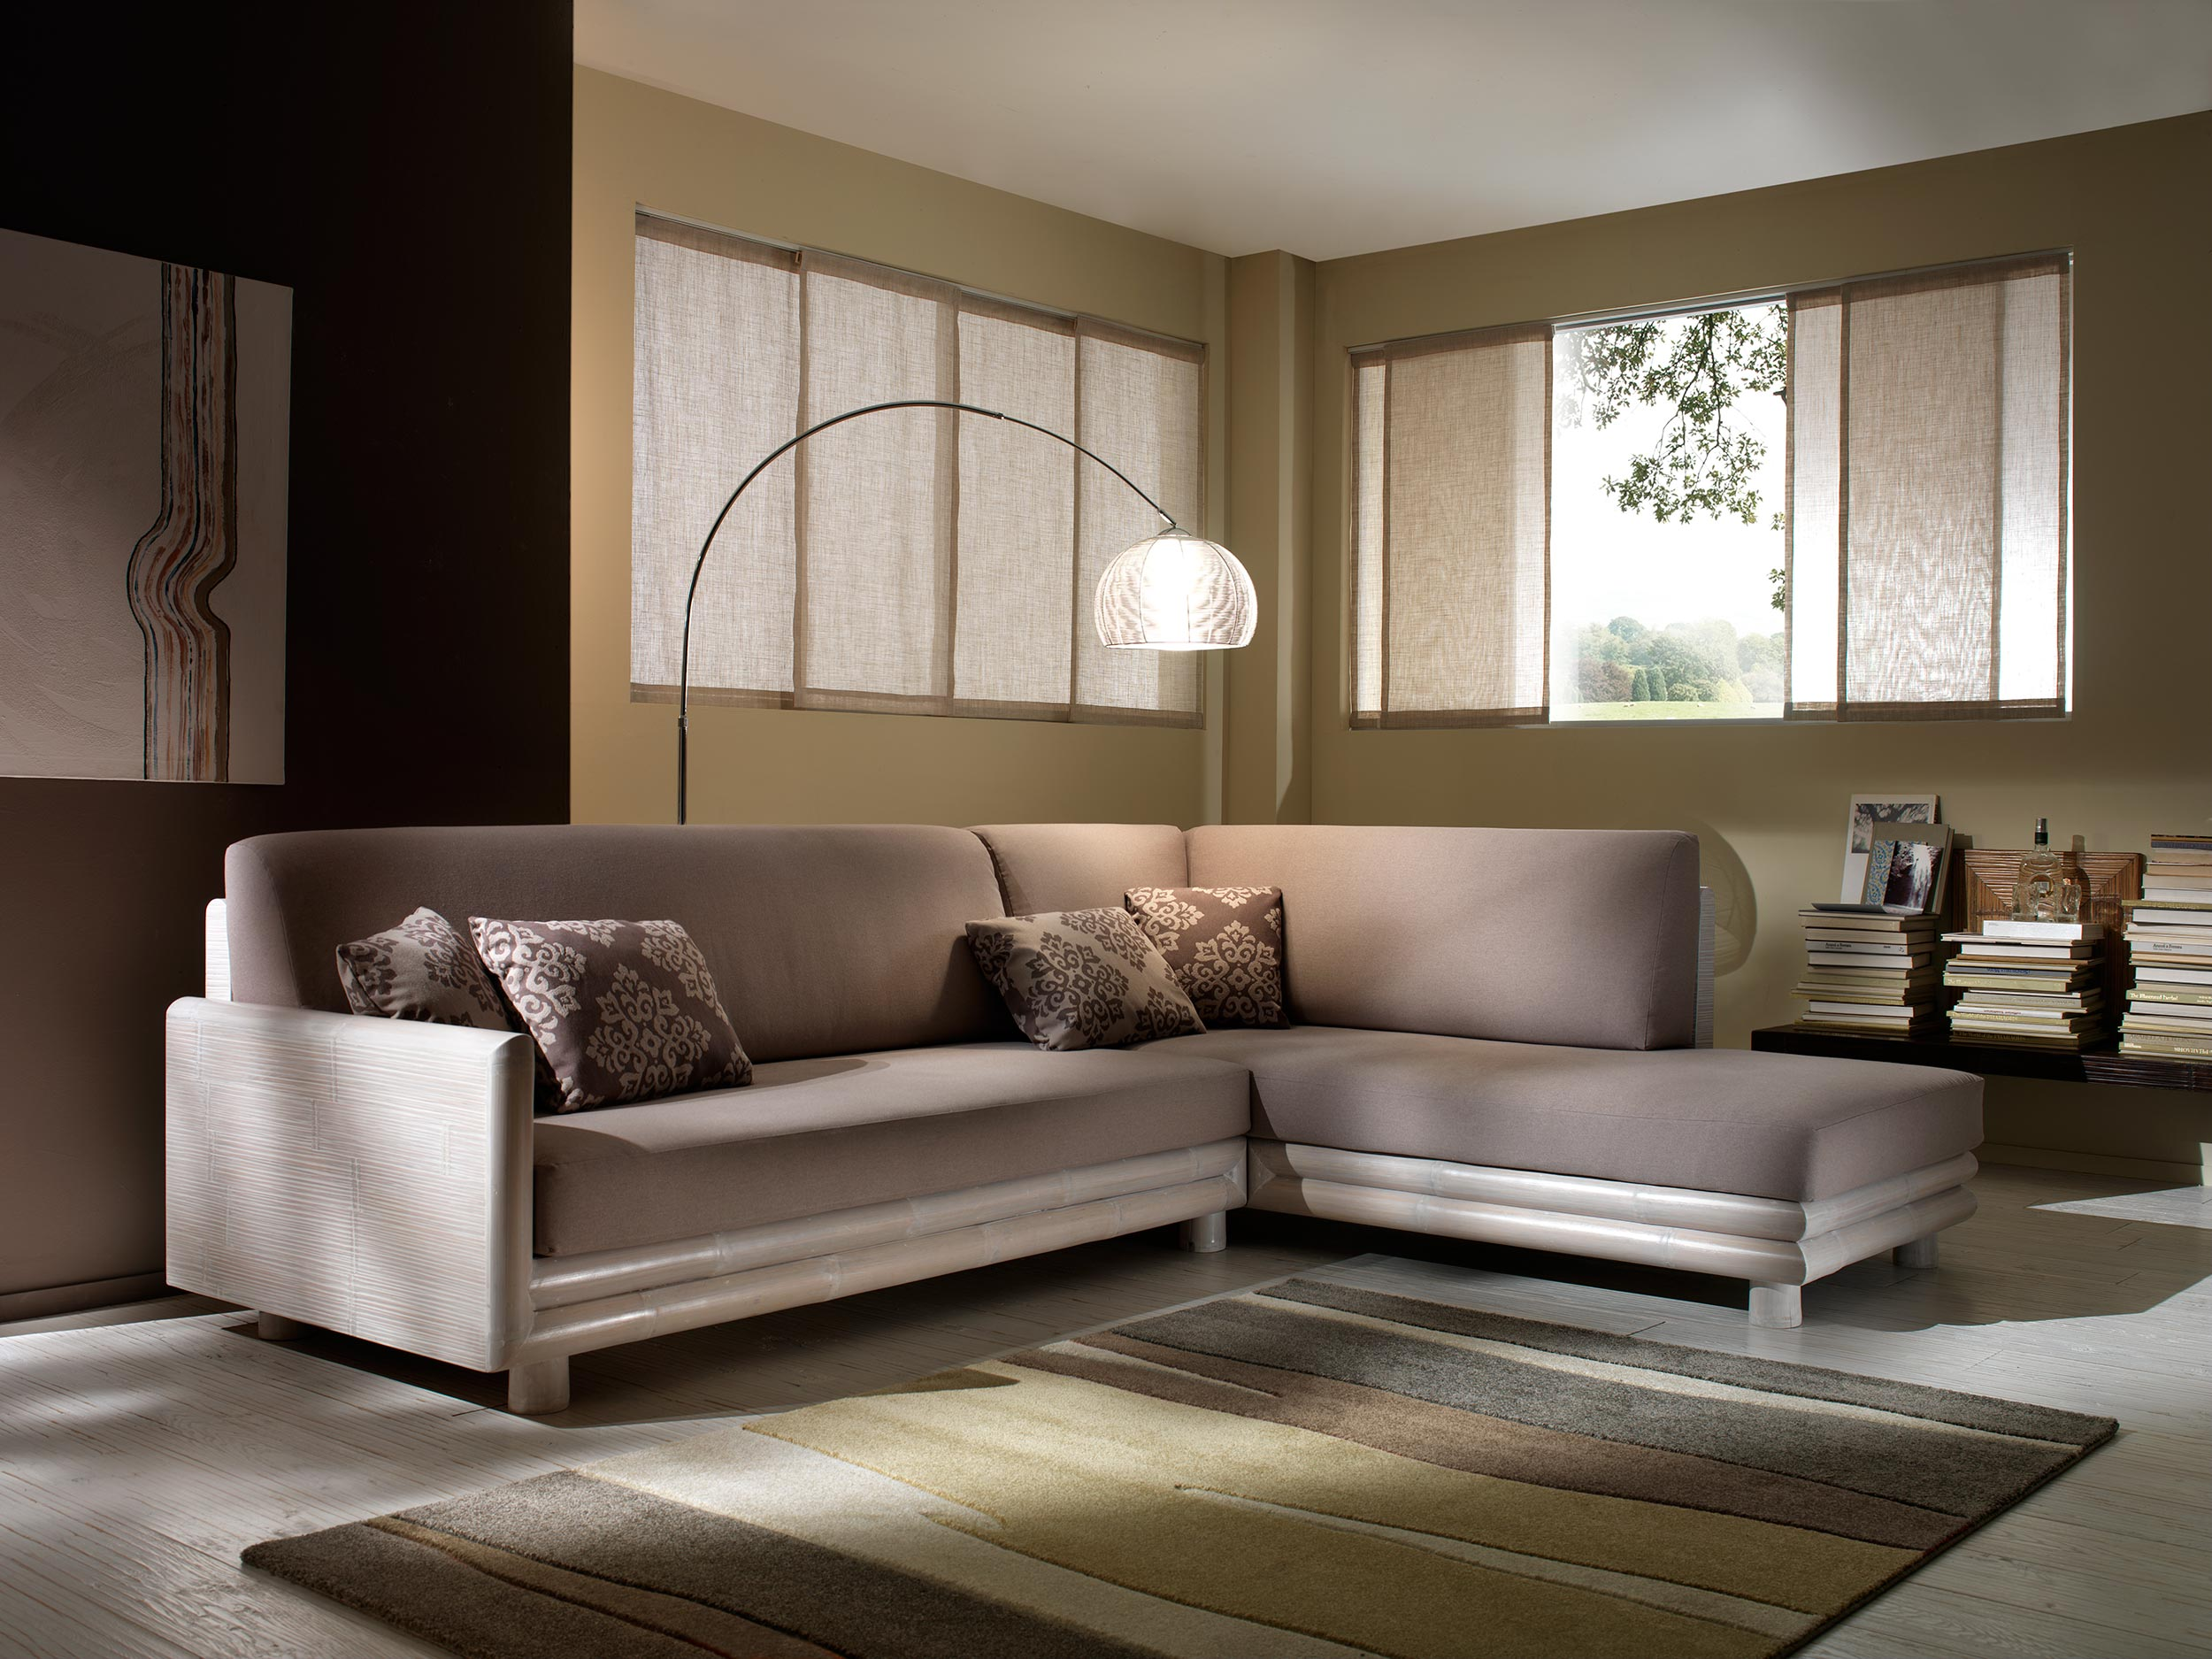 salon d 39 angle bambou finition c rus blanc zen. Black Bedroom Furniture Sets. Home Design Ideas